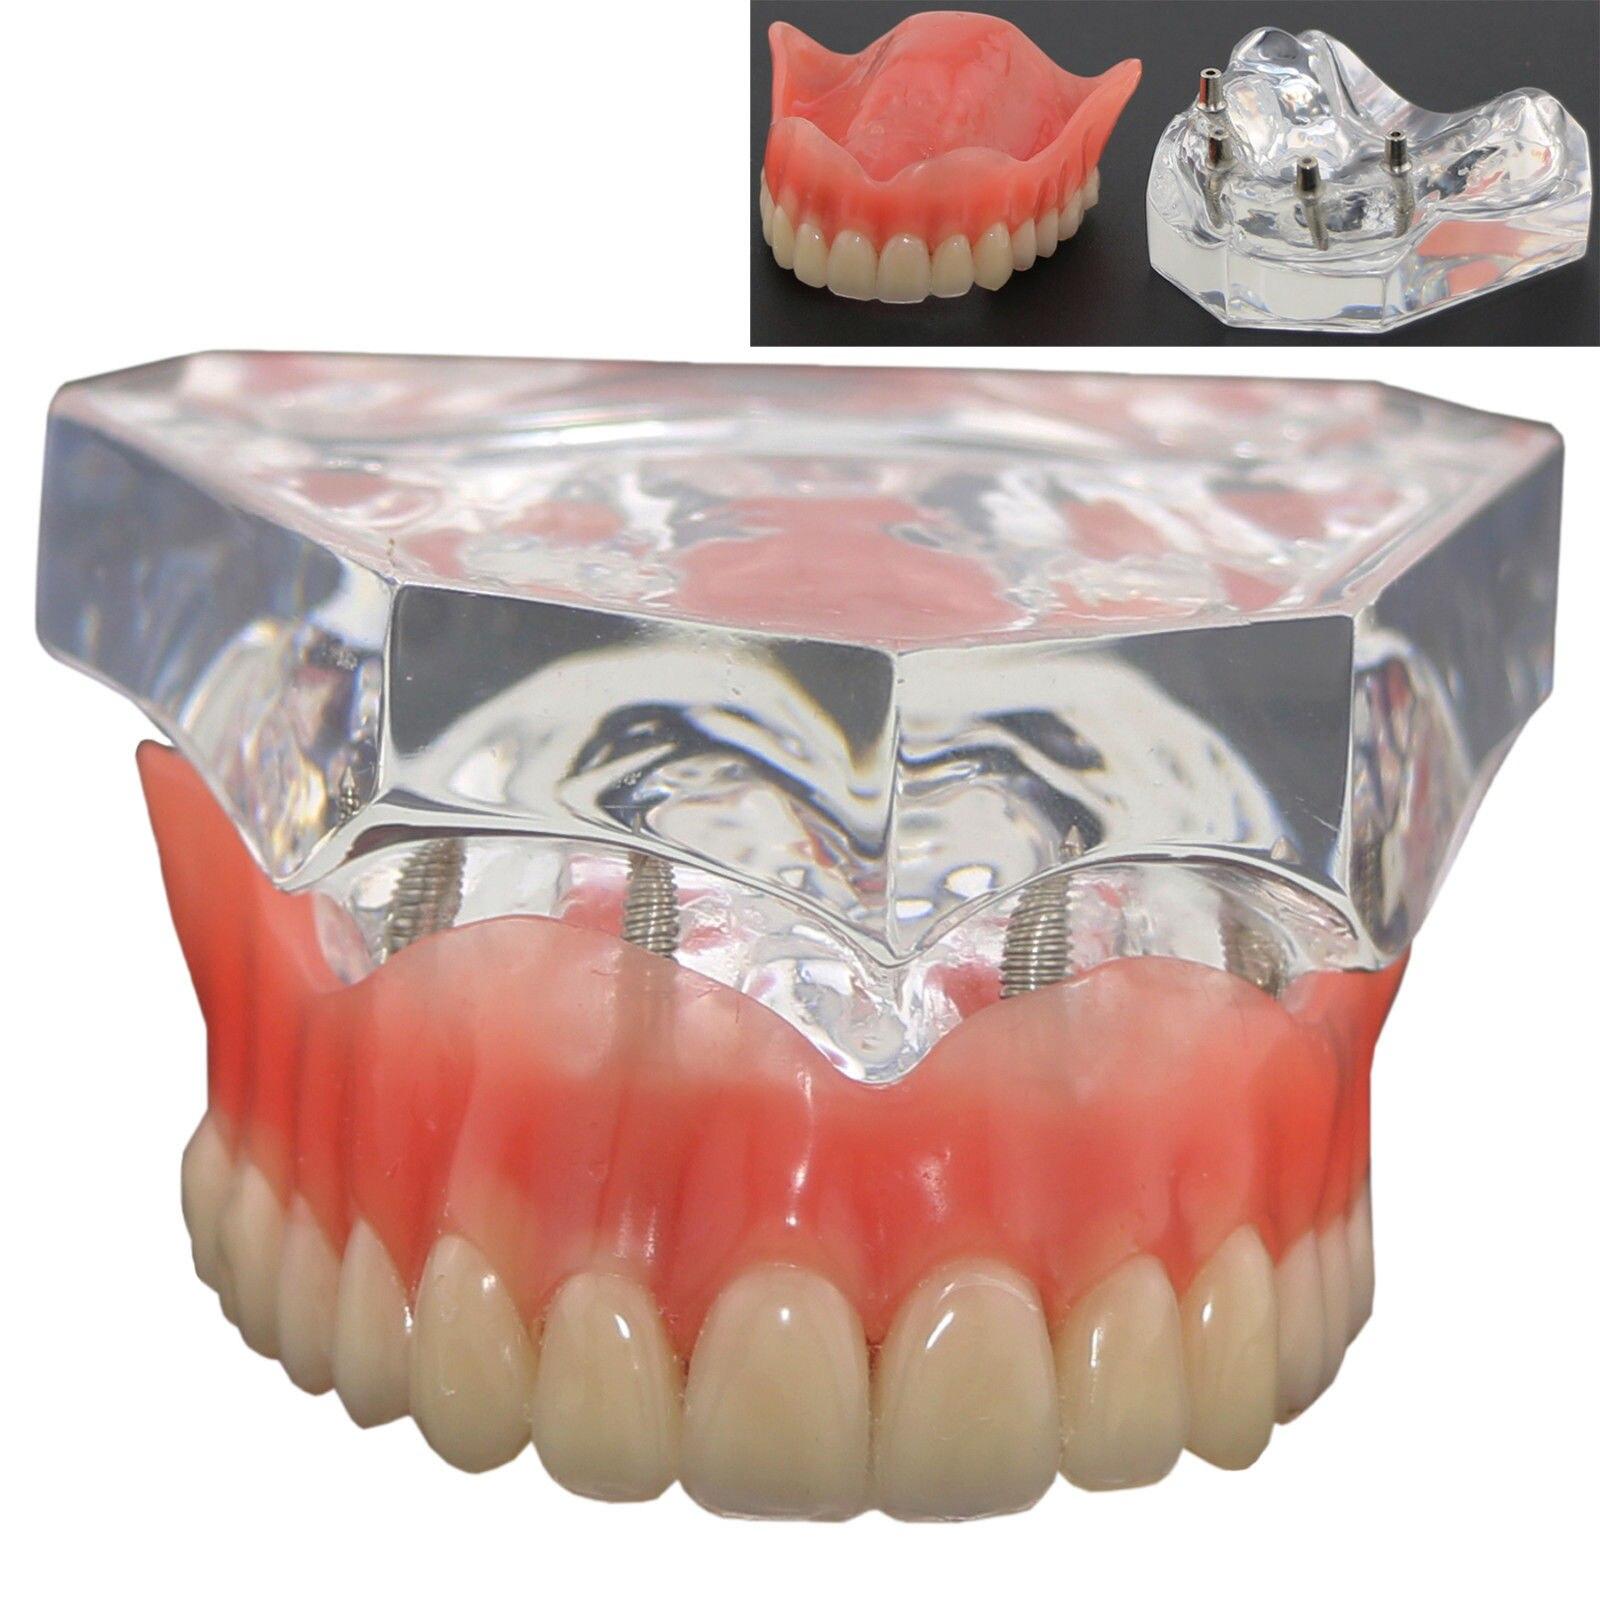 Dental Upper Teeth Model Overdenture Superior 4 Implants Demo Model 6001 02 science of dental implants